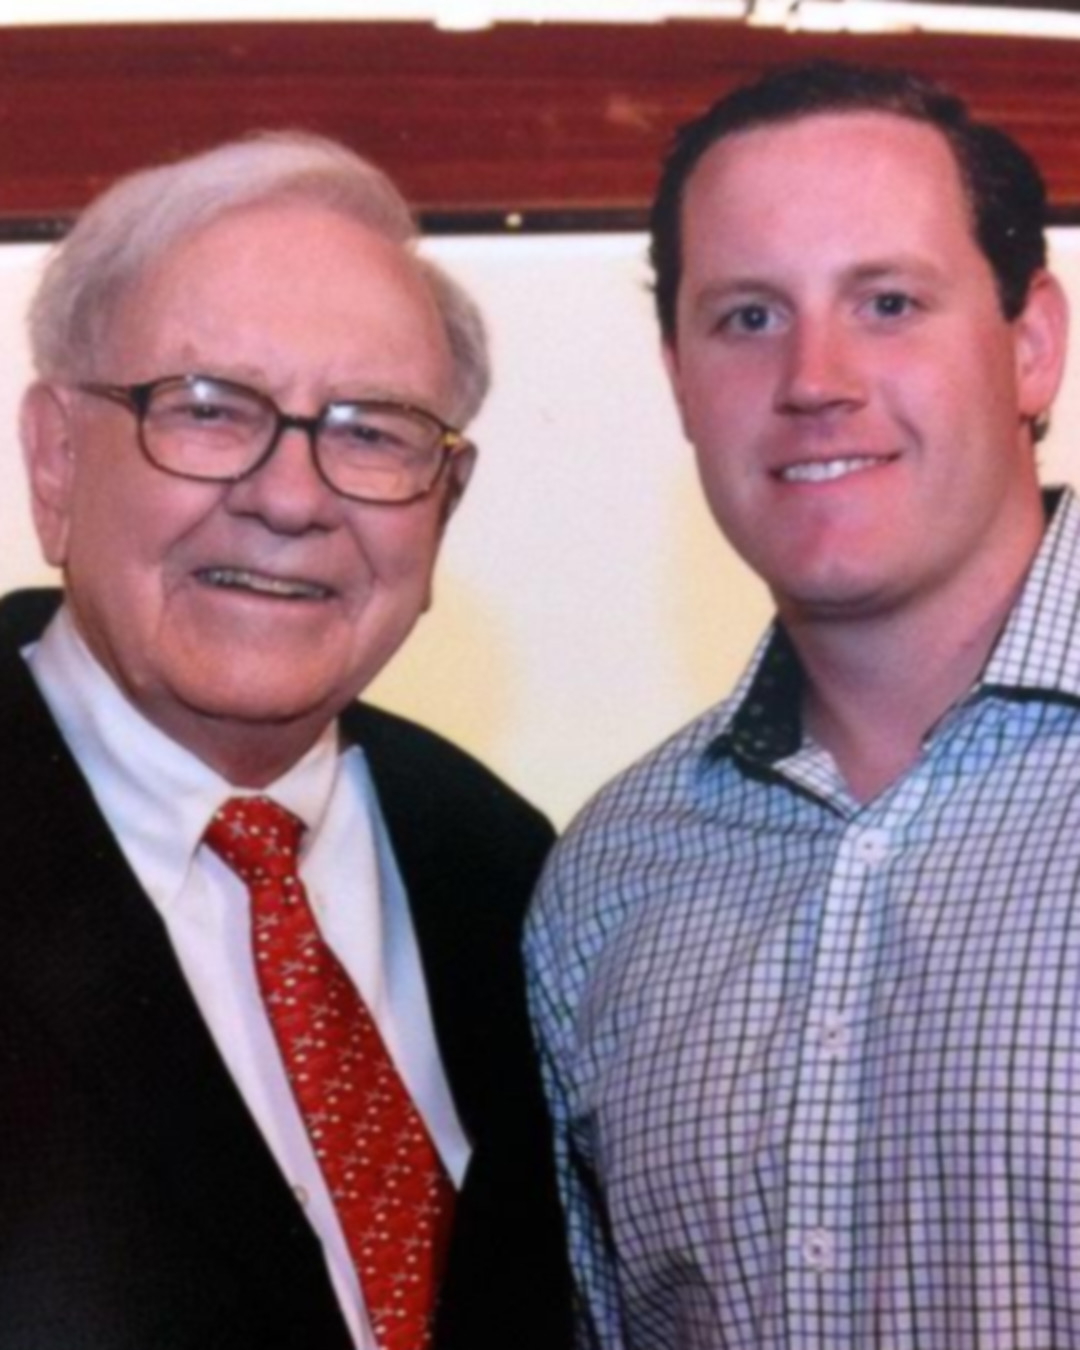 Warren Buffett photo #112549, Warren Buffett image